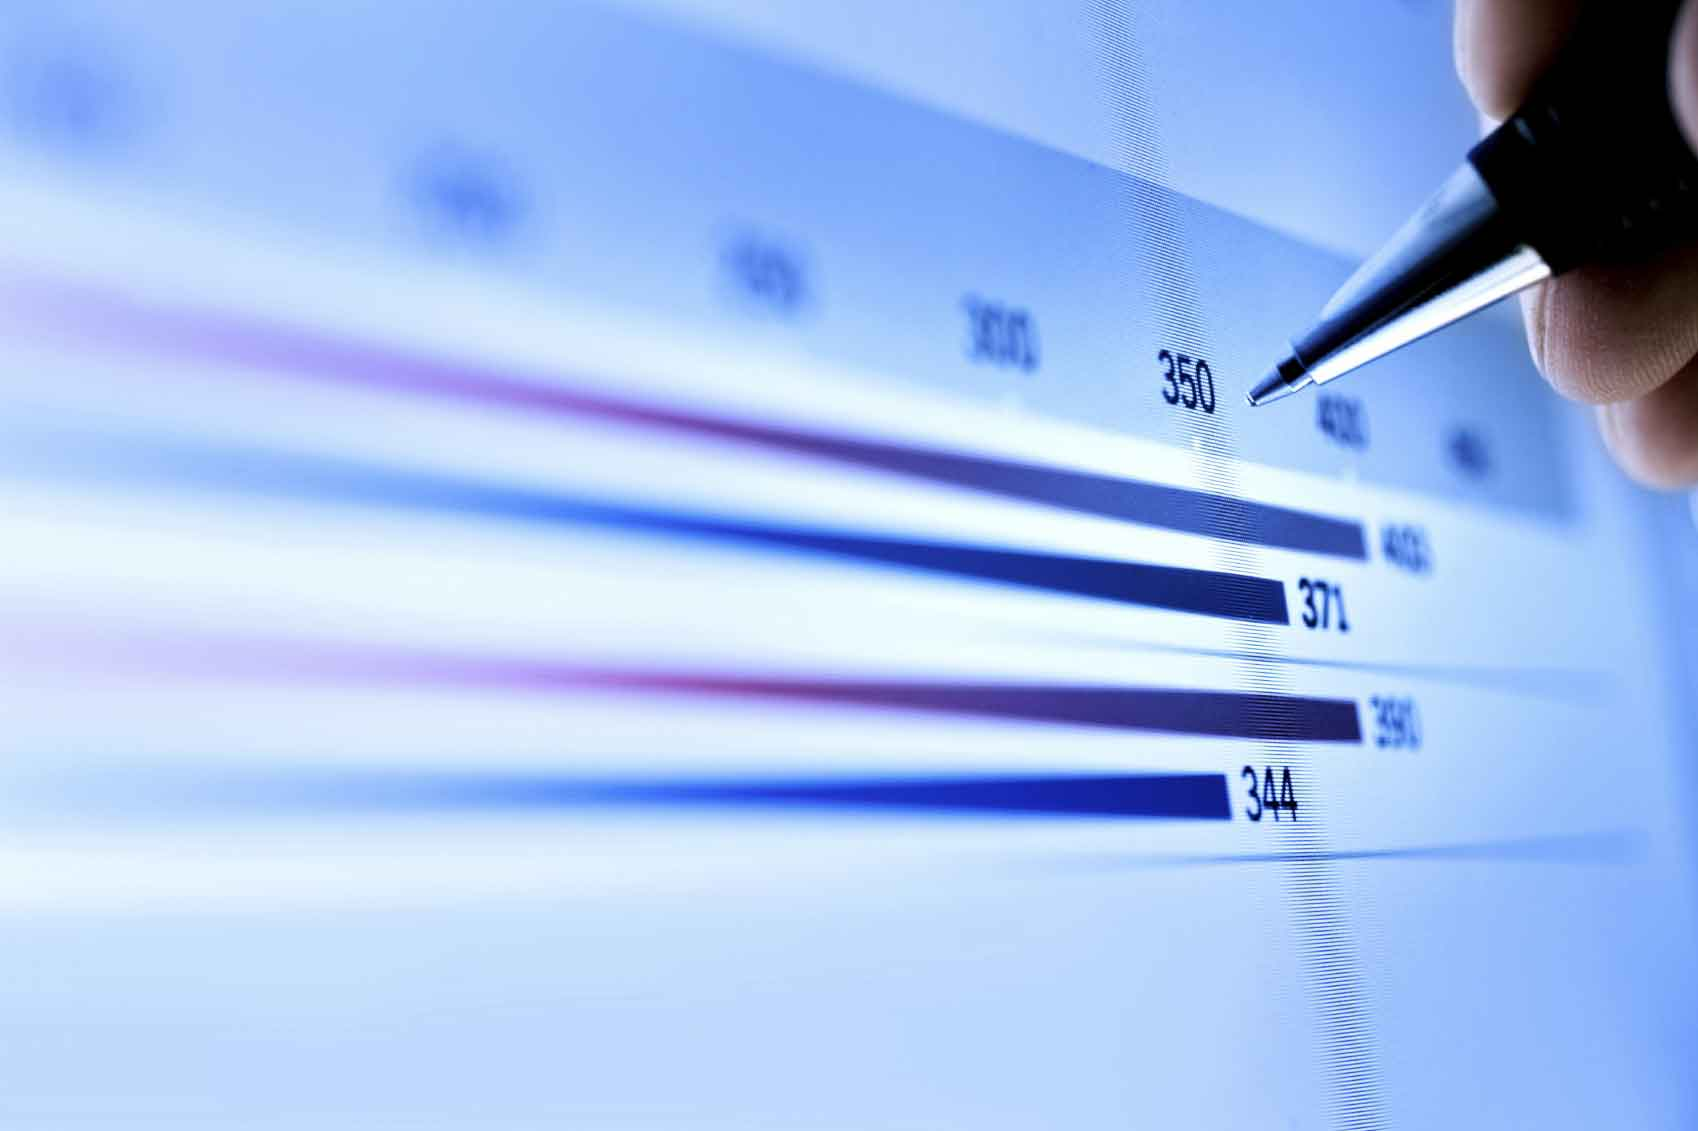 Mettler-Toledo offers guidance on verification of titration analysis values